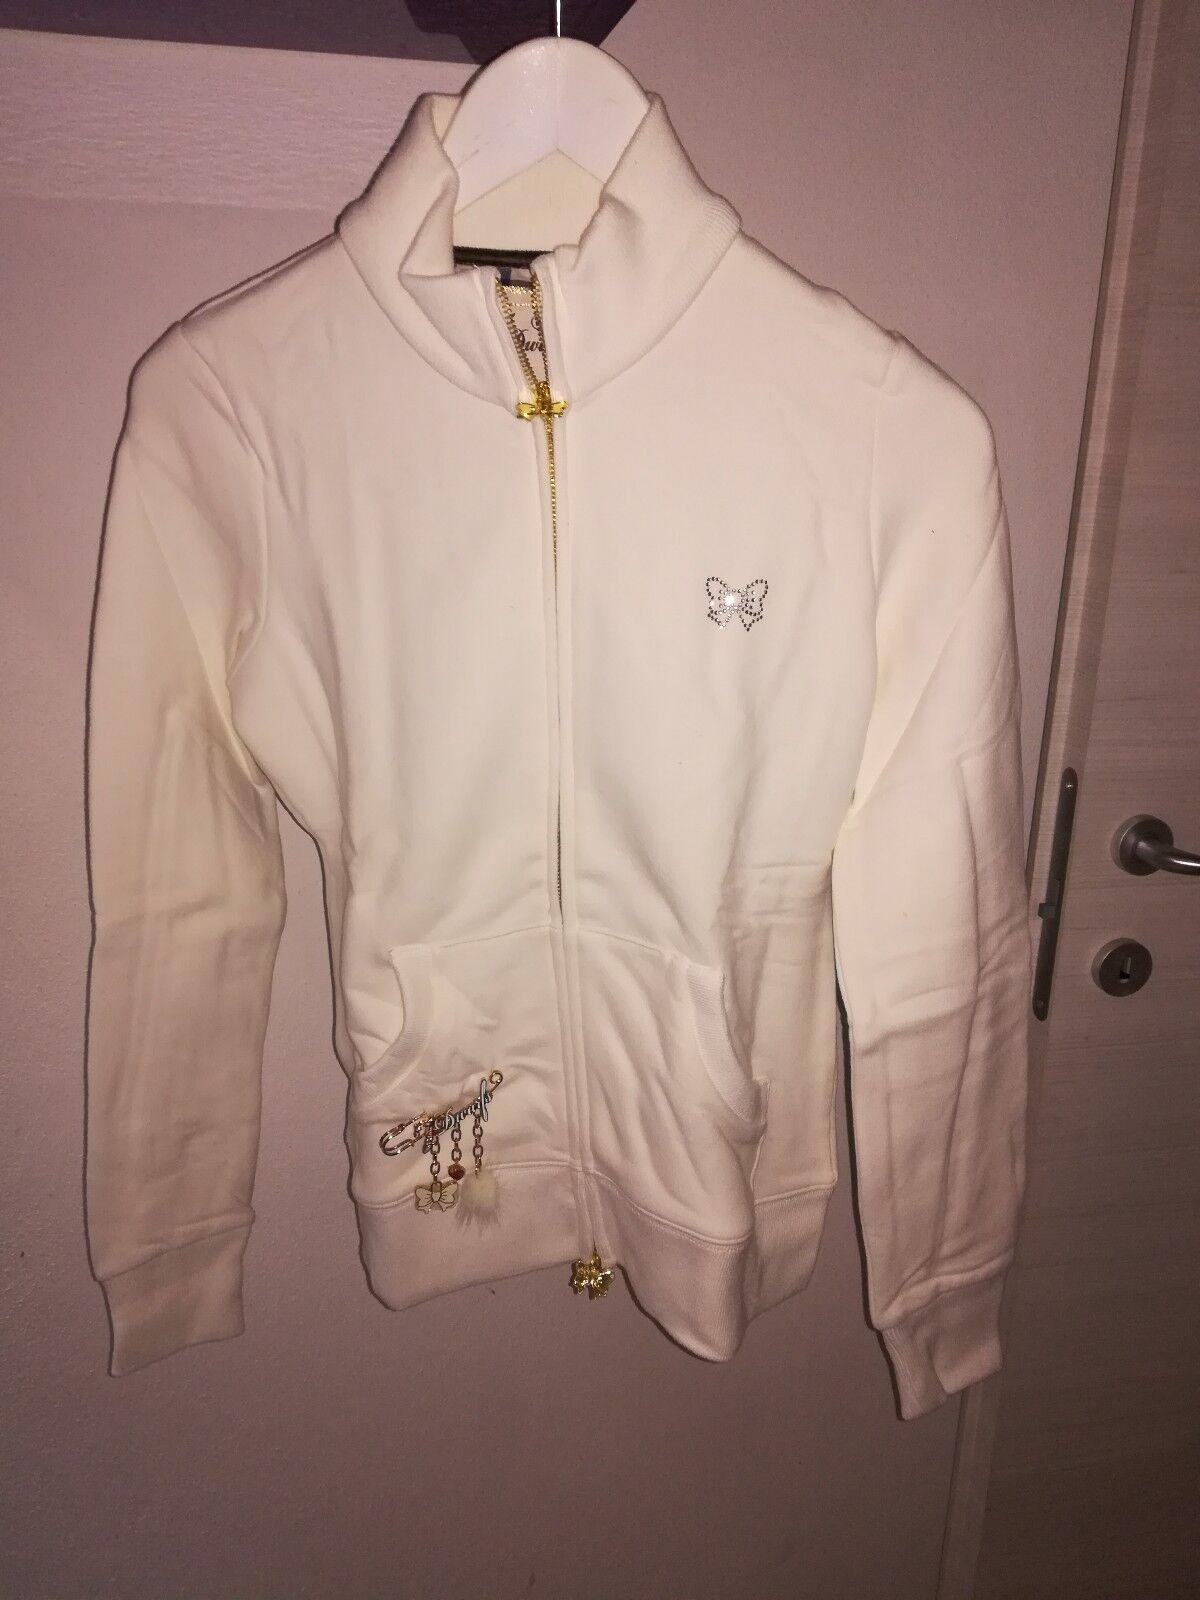 FIX DESIGN Felpa women 7 Nani Mammolo color Bianco TG S Zip Strass